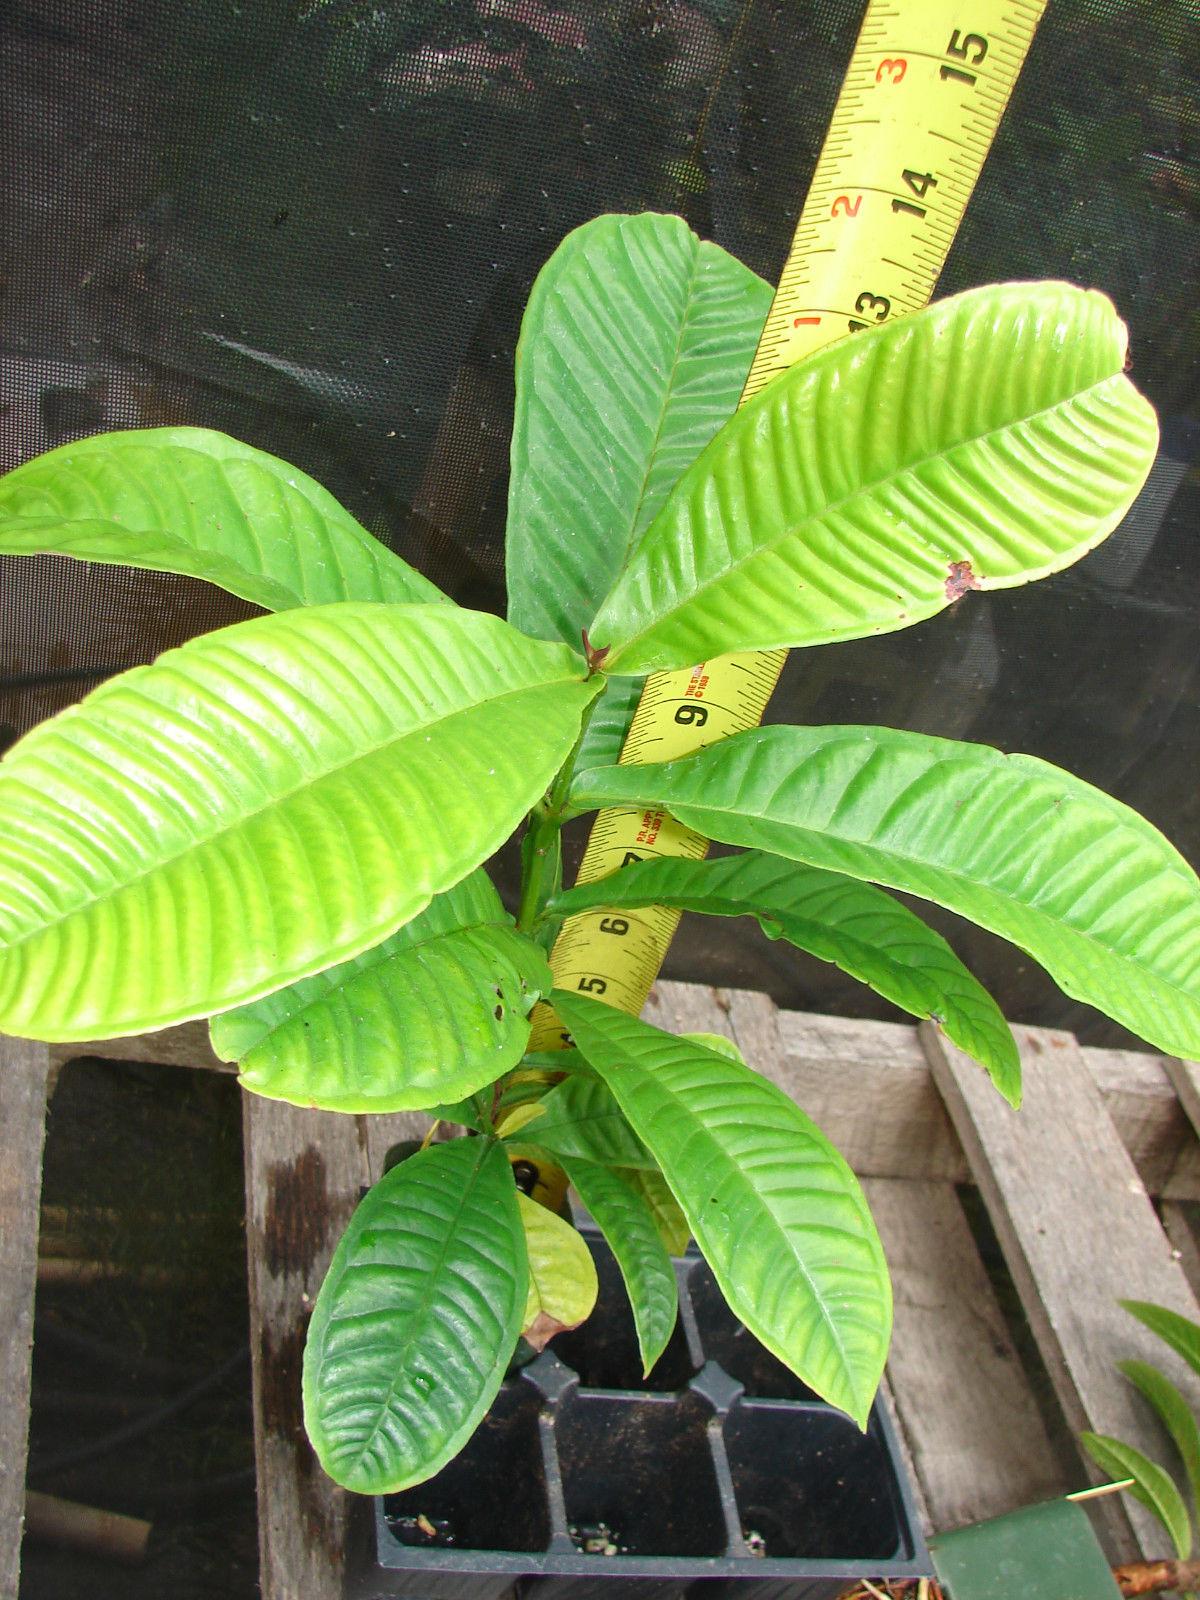 Polynesian Produce Stand Gowak Syzygium Polycephalum